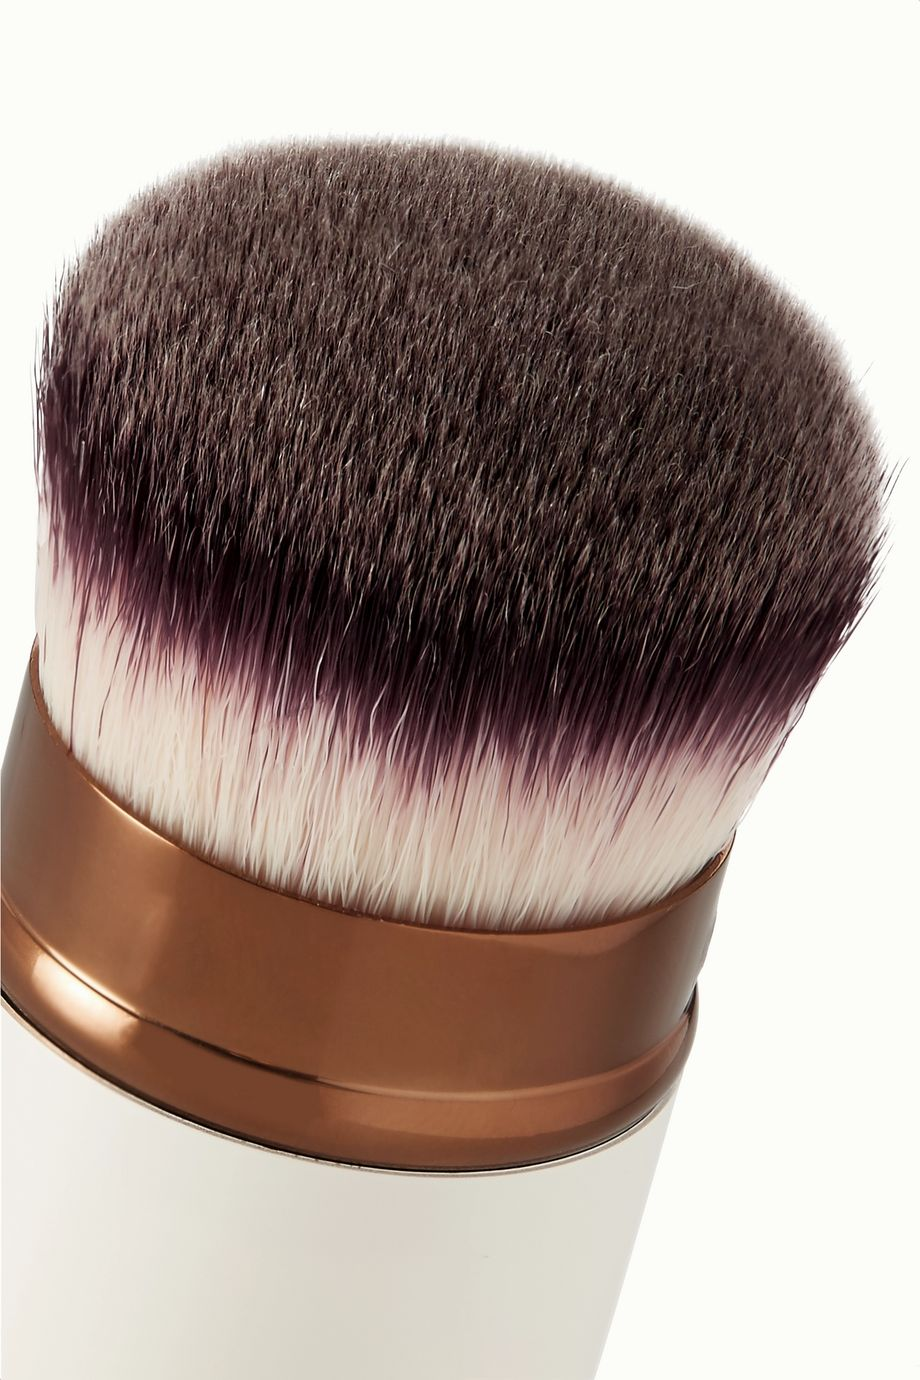 Lilah B. Retractable Crème Foundation Brush #6